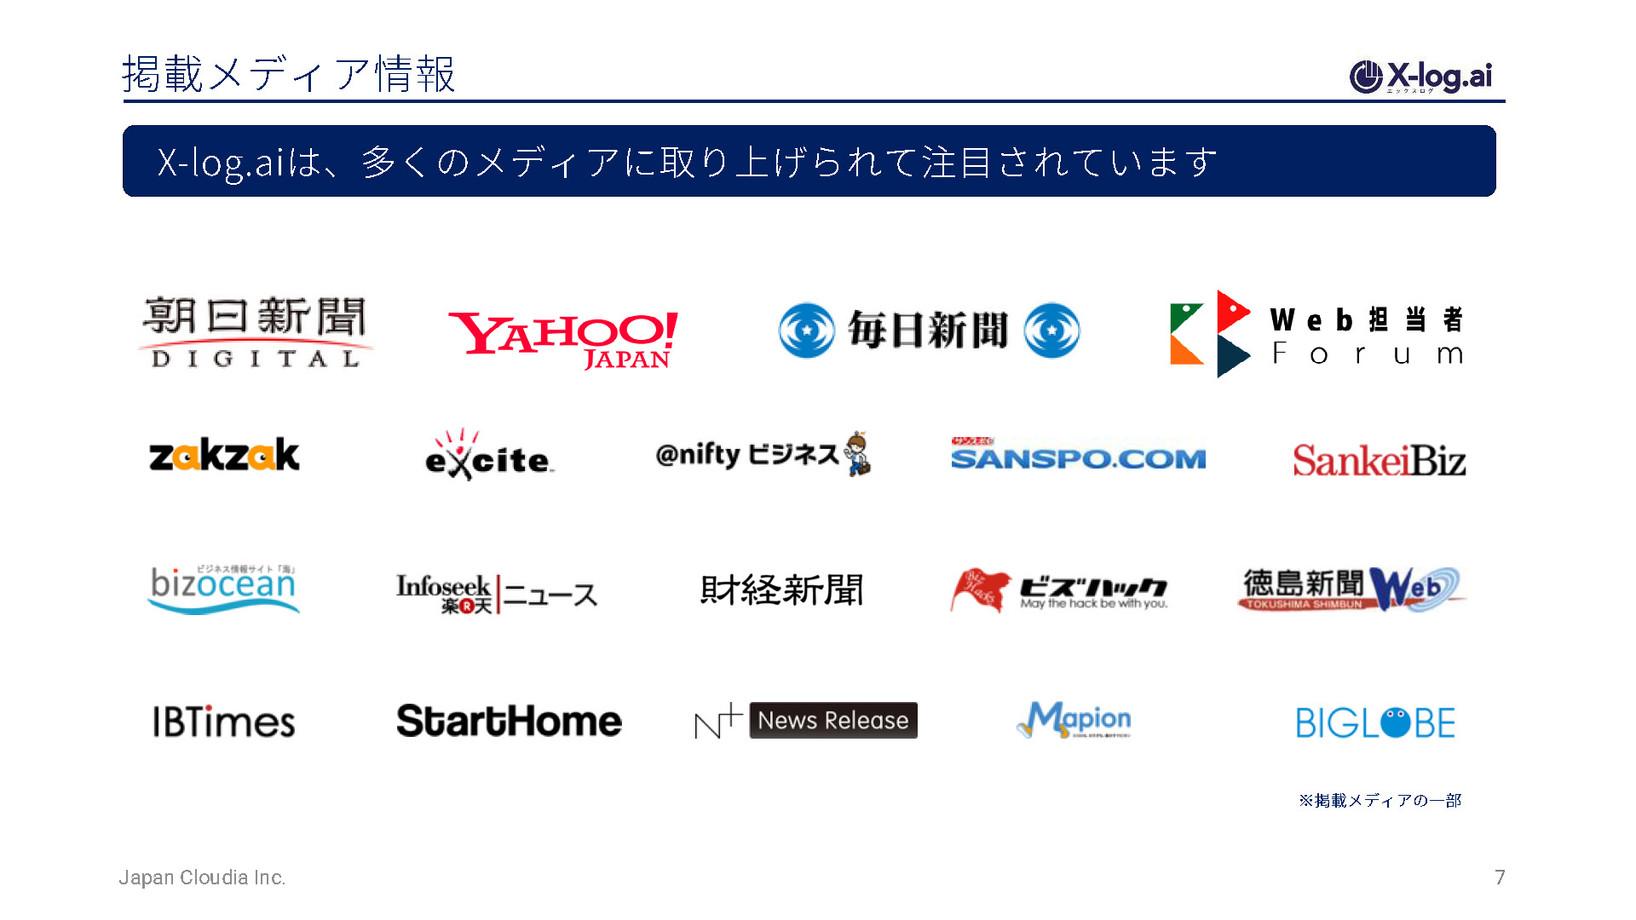 X-log.aiご案内資料_ページ_07.jpg